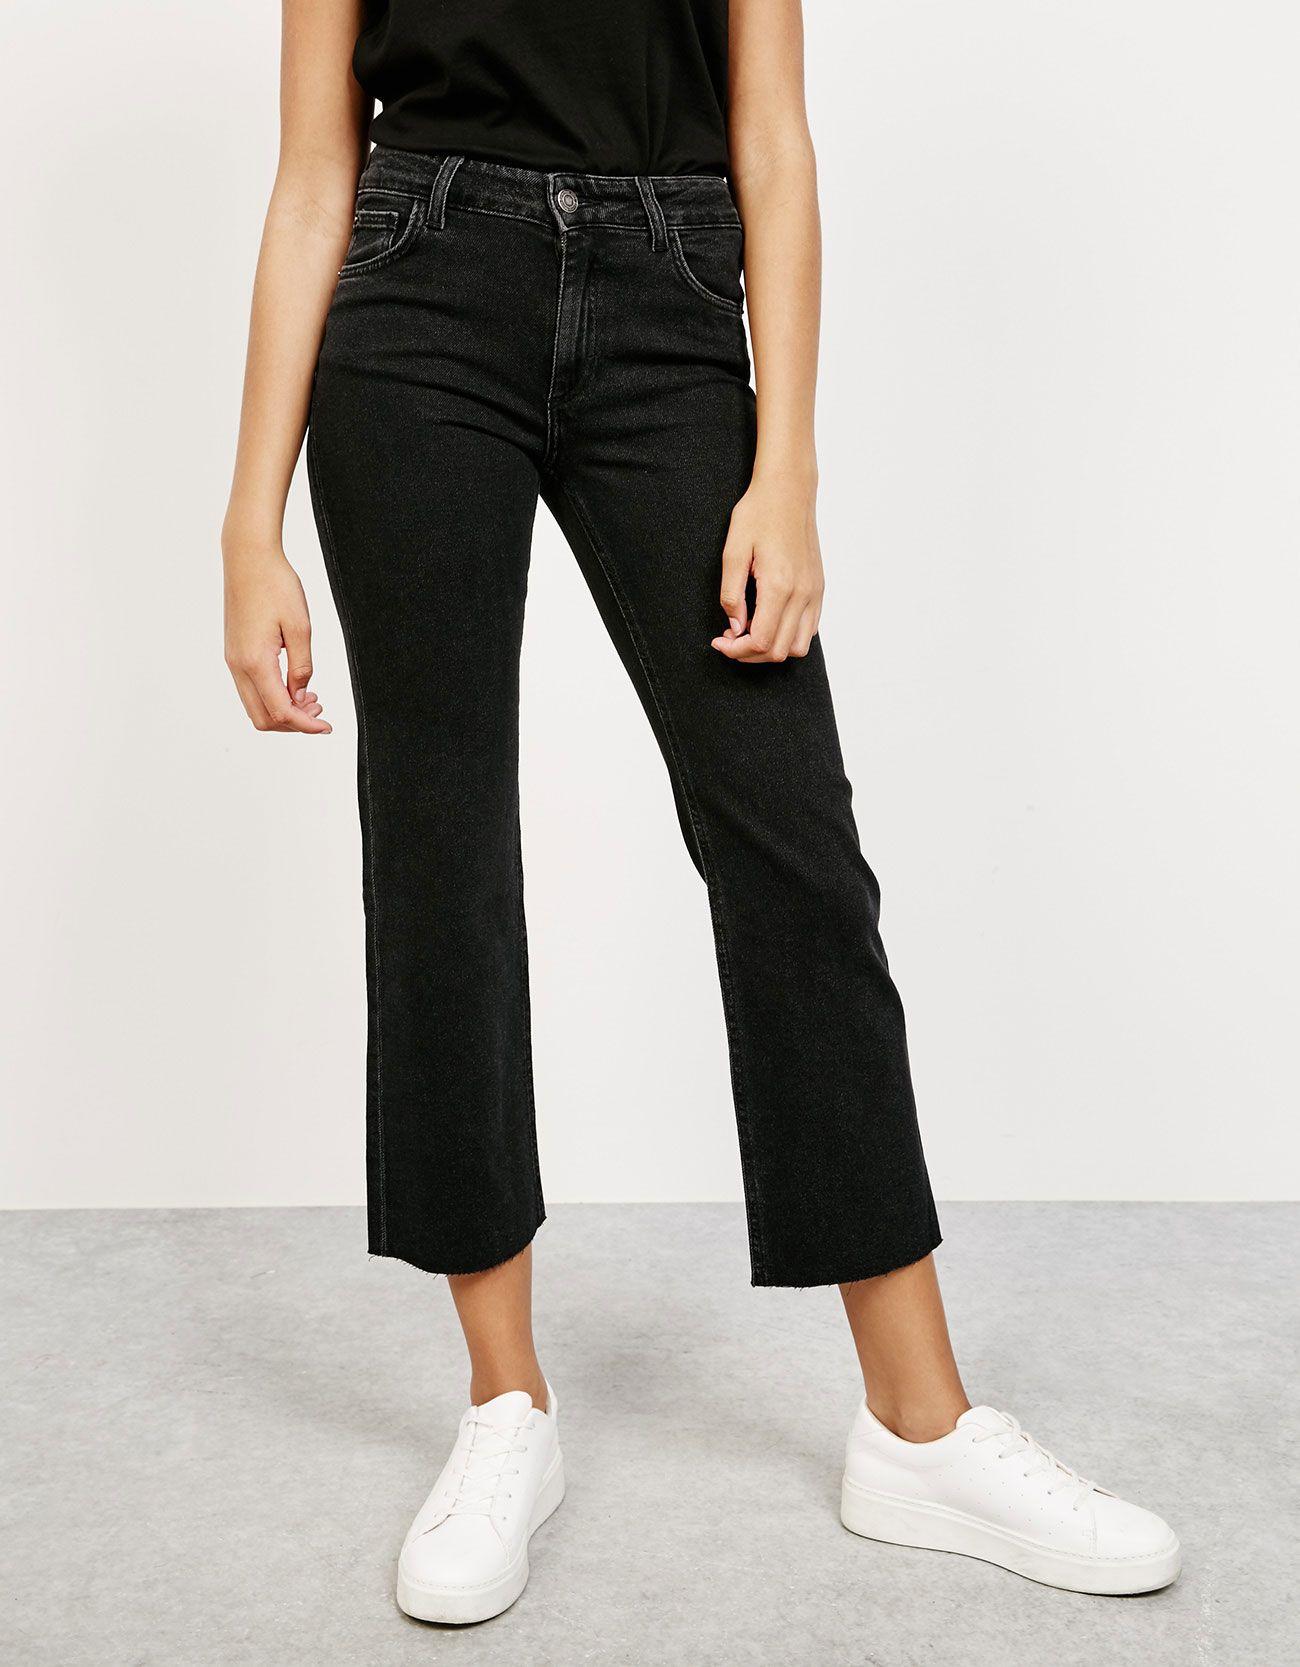 Kick flare jeans with seamless hem